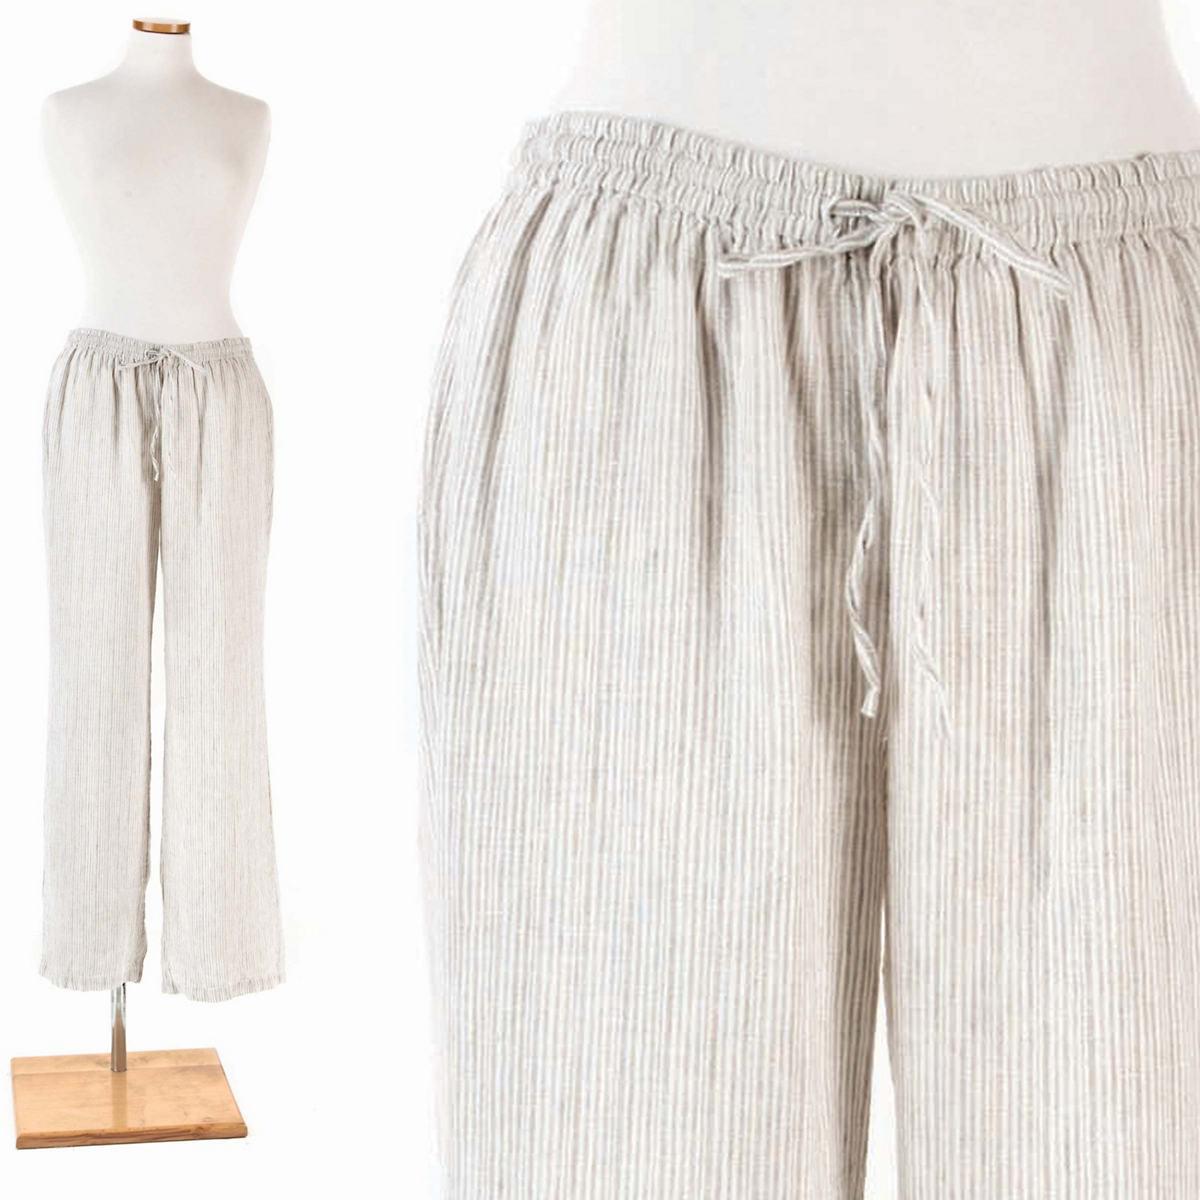 Pinstripe Linen Dove Grey Lounge Pant